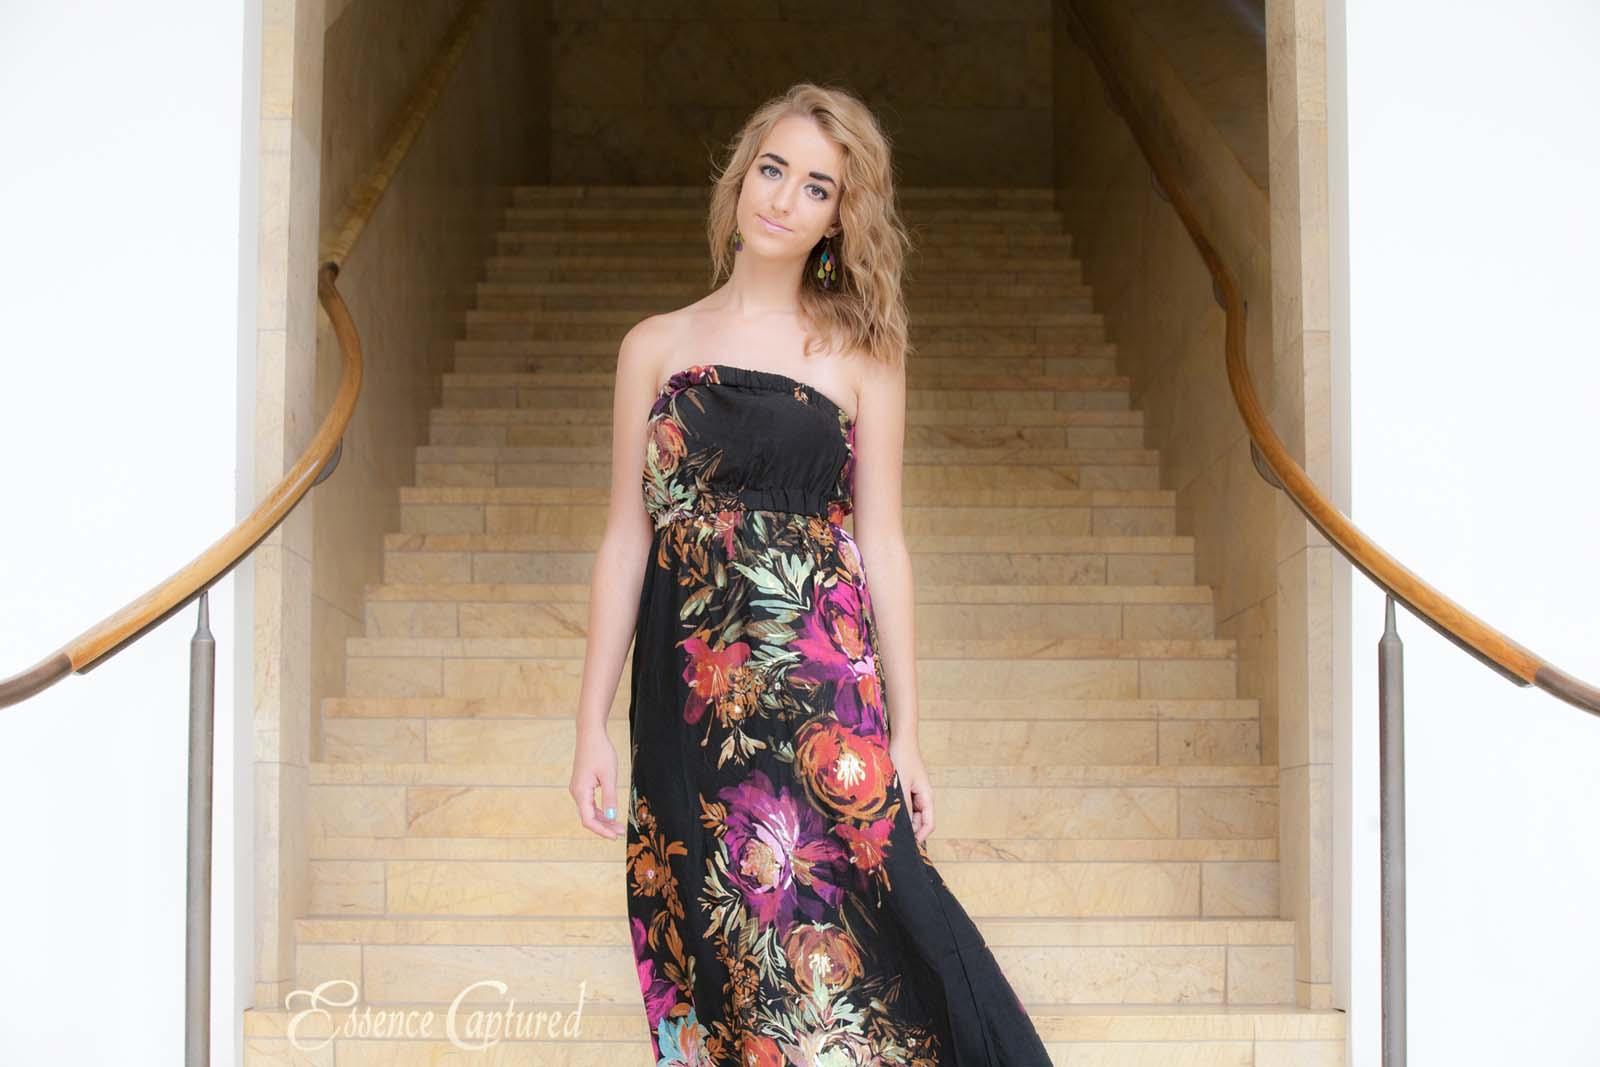 high school senior portrait female flowered print dress elegant stairway backdrop